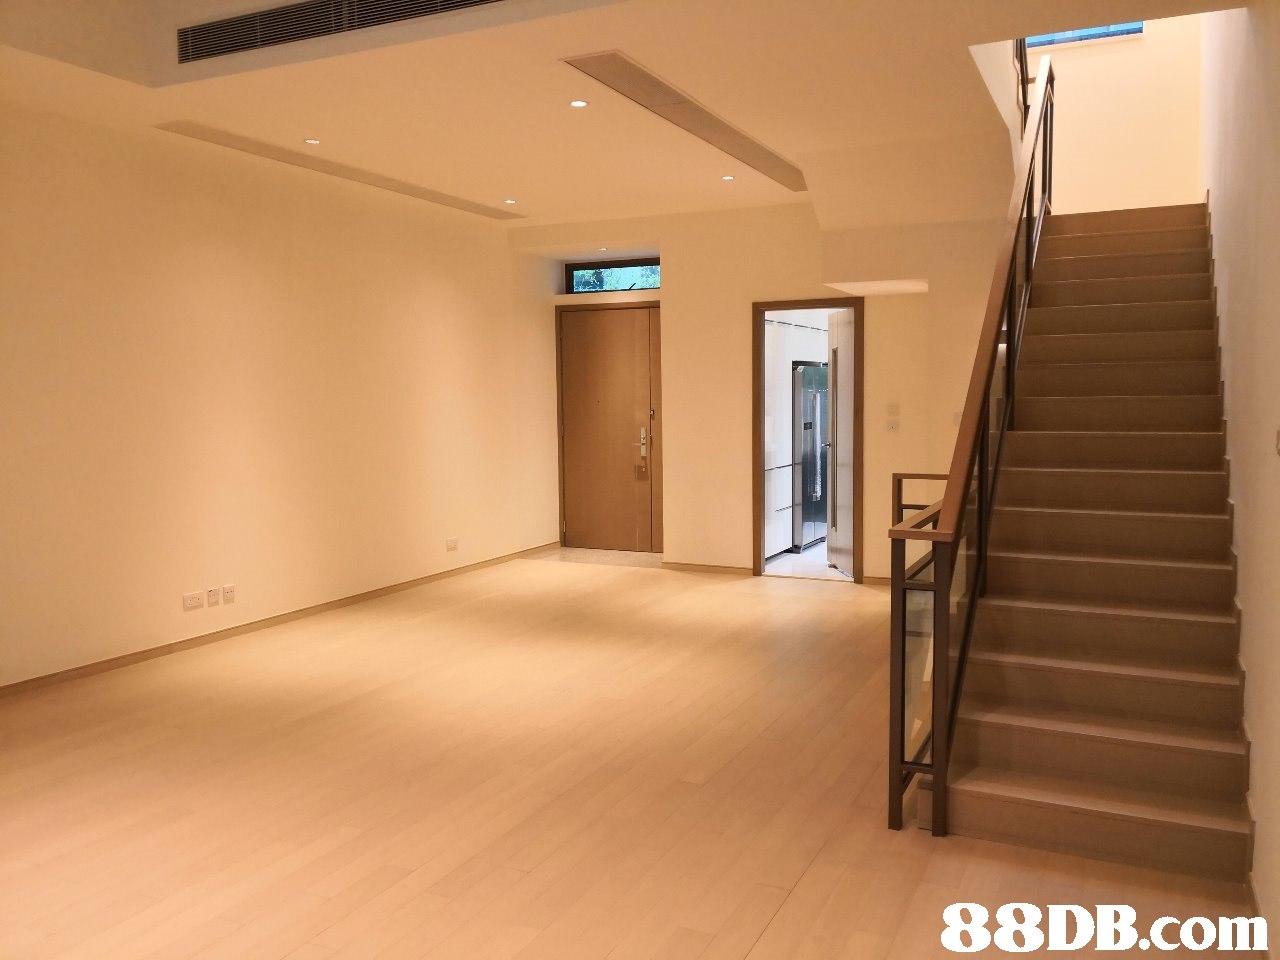 property,room,floor,real estate,flooring